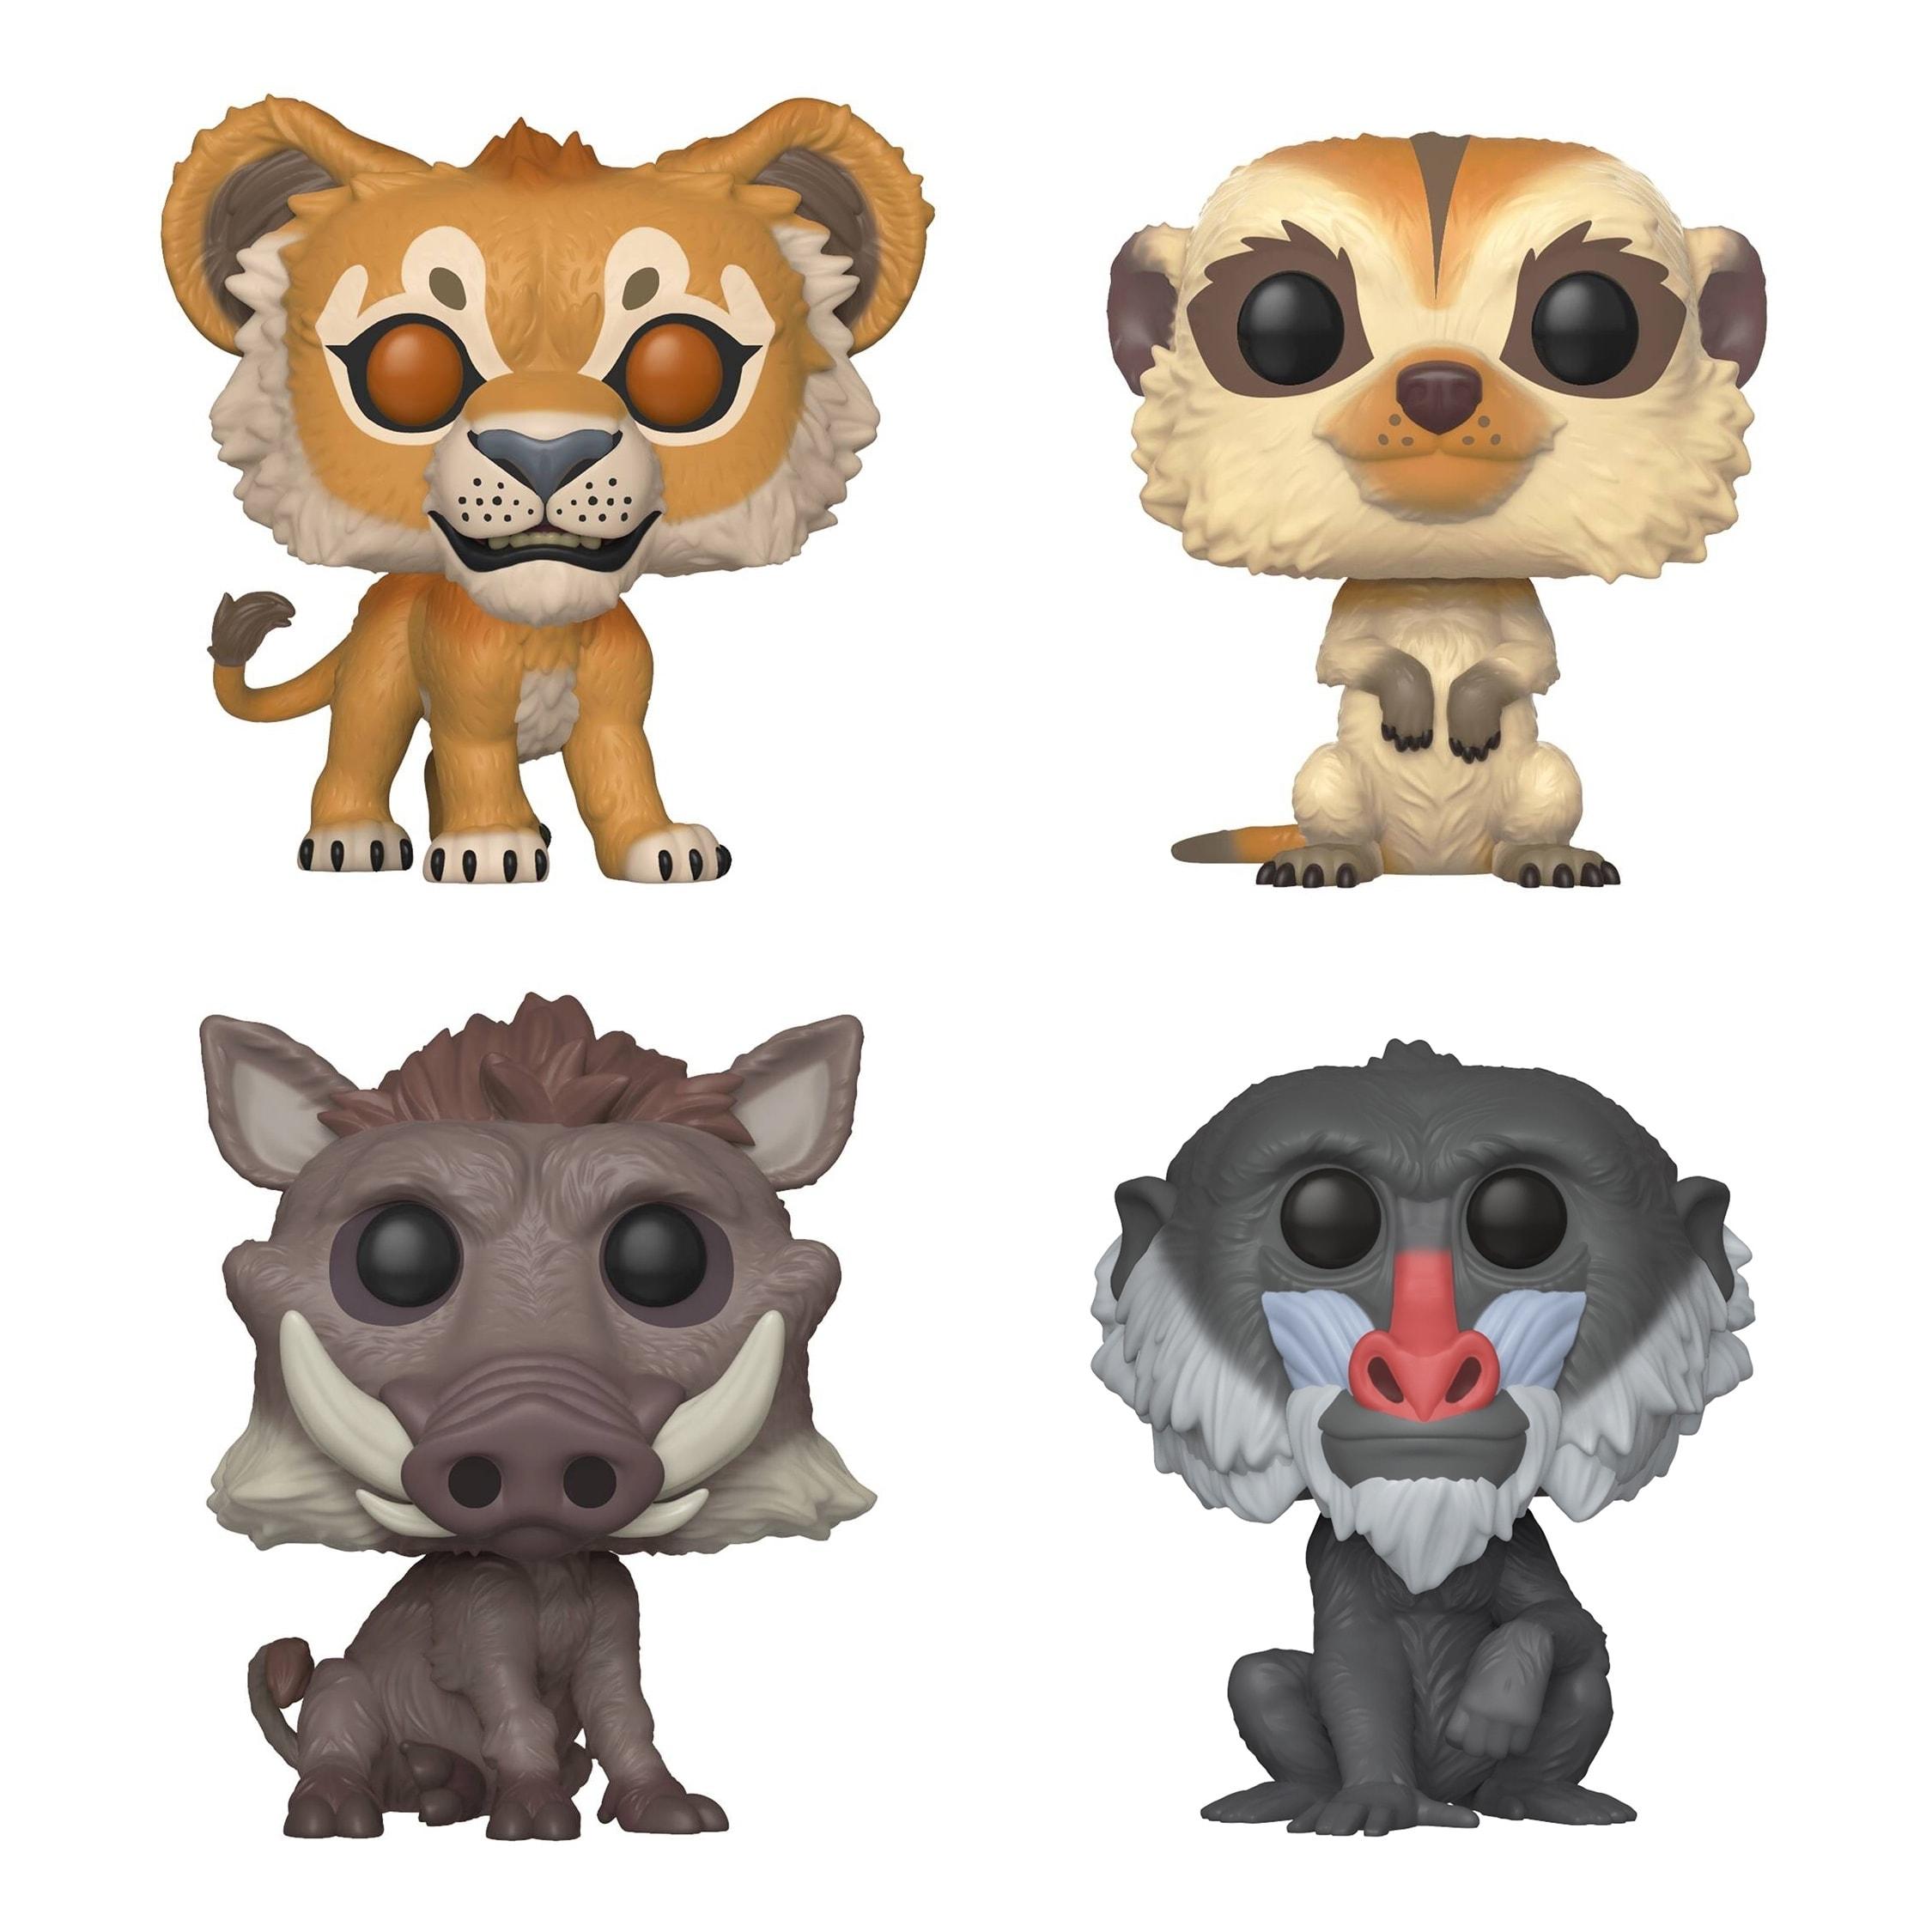 Disney Timon Pumbaa Figure Collector Pack Park Series 2 Lion King Disneykin 2003